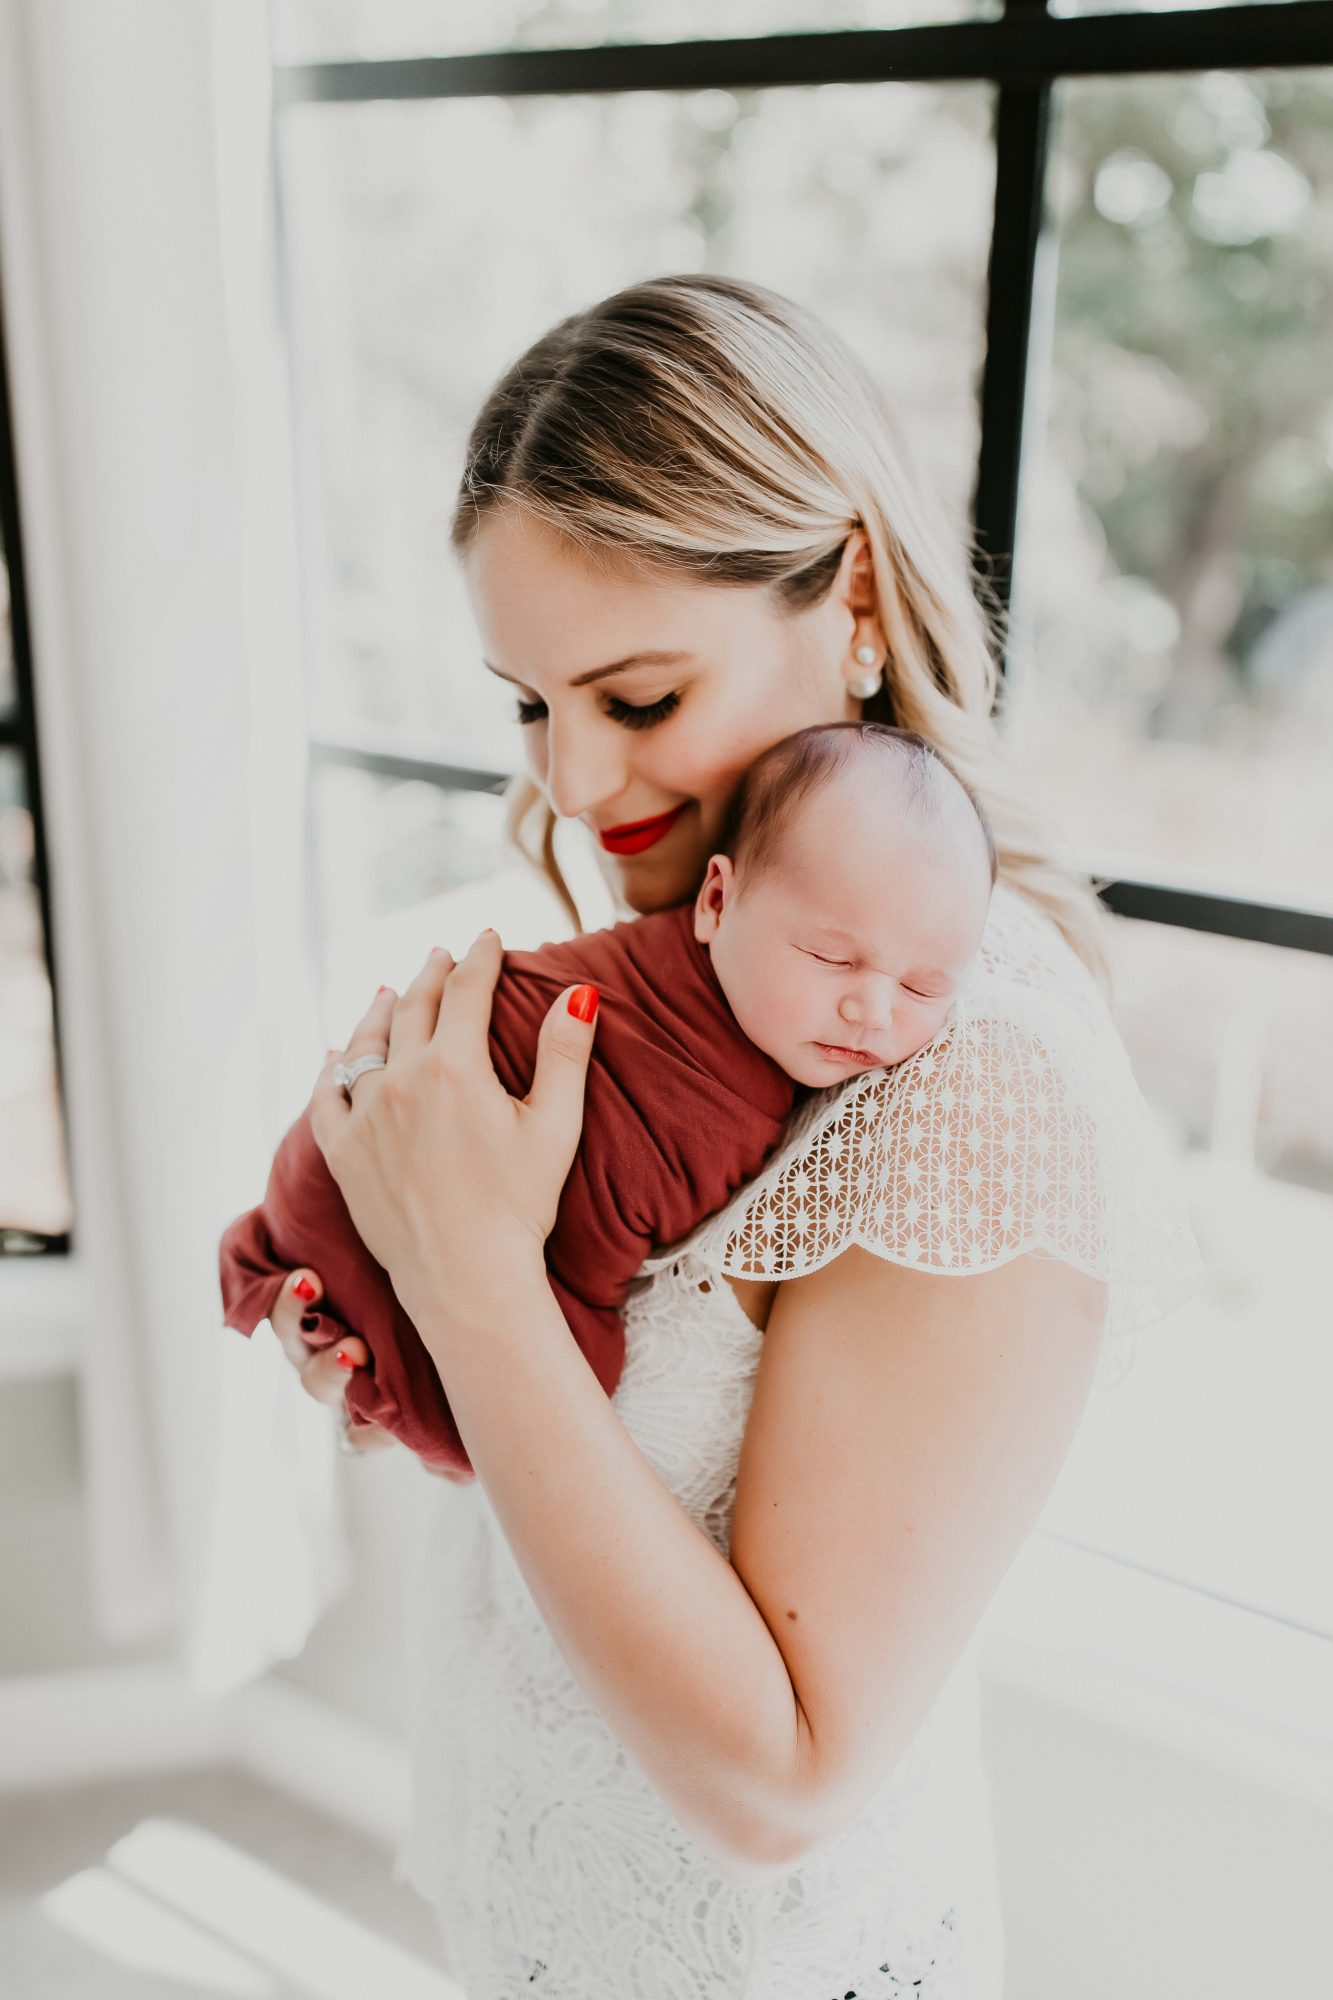 Newborn Photographer in San Francisco - 24